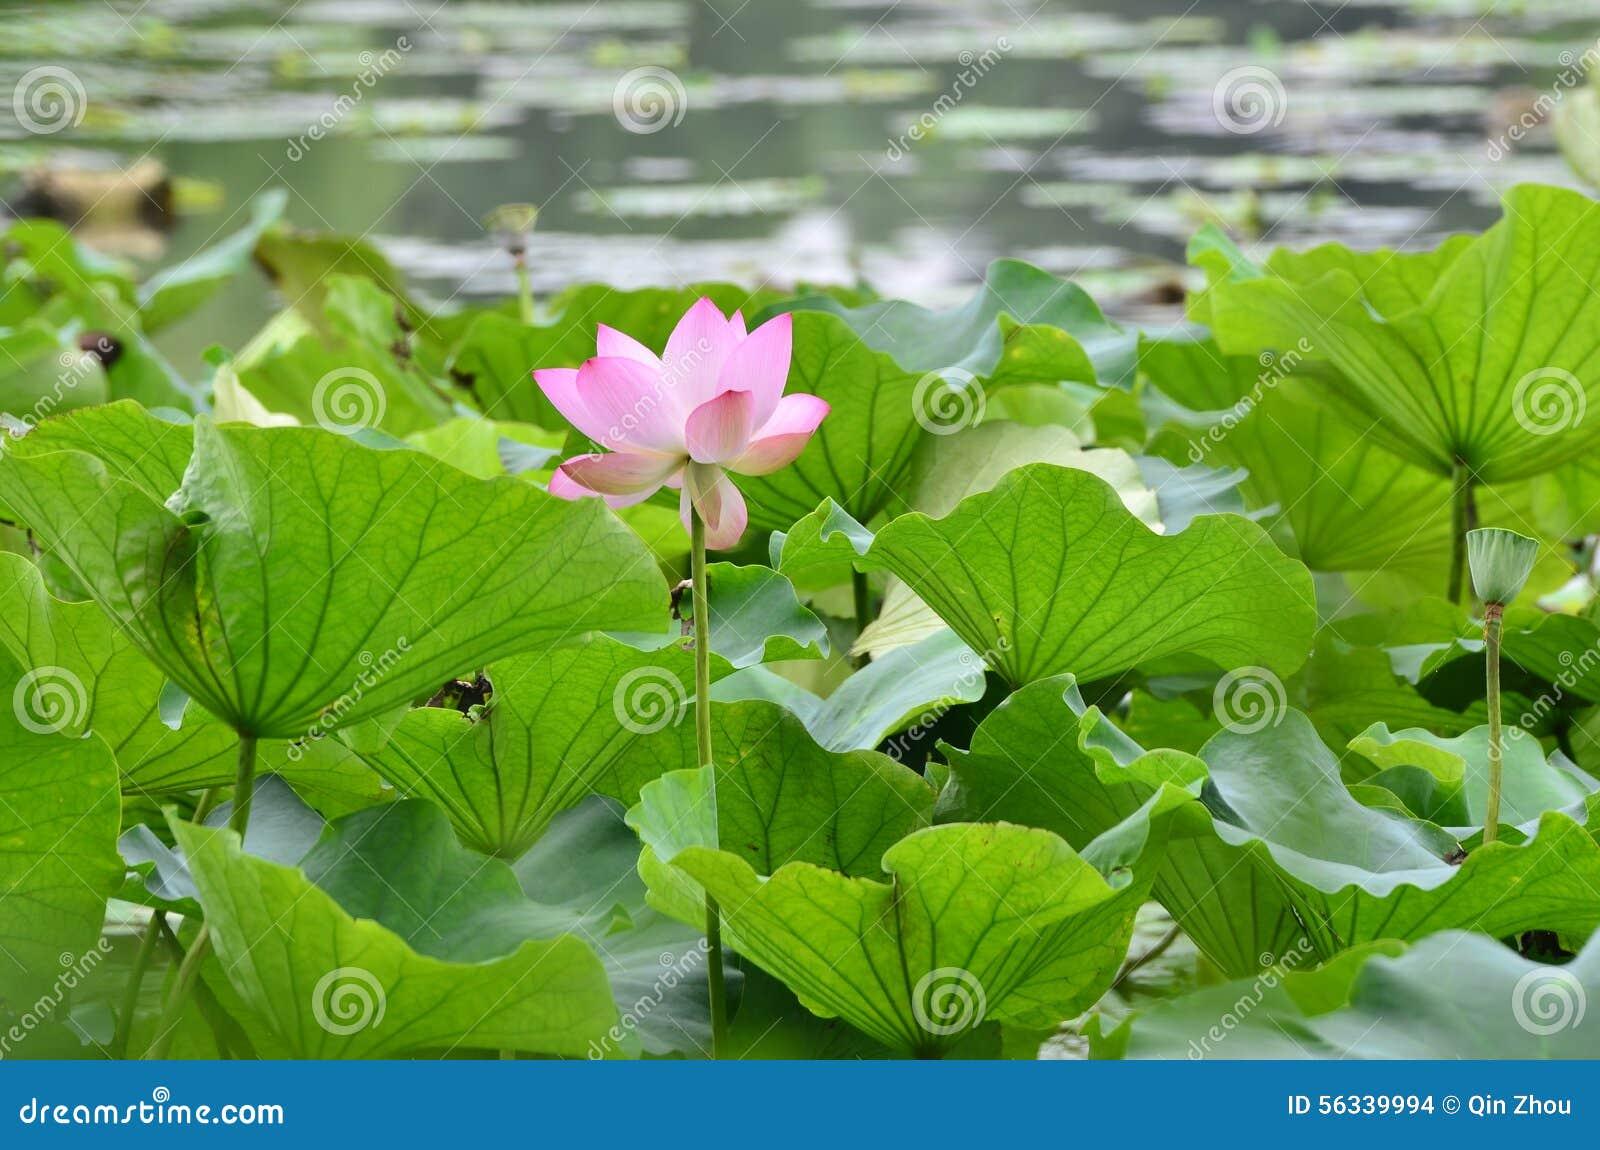 The lotus bloom in the yangcheng lake peninsula at suzhou china royalty free stock photo izmirmasajfo